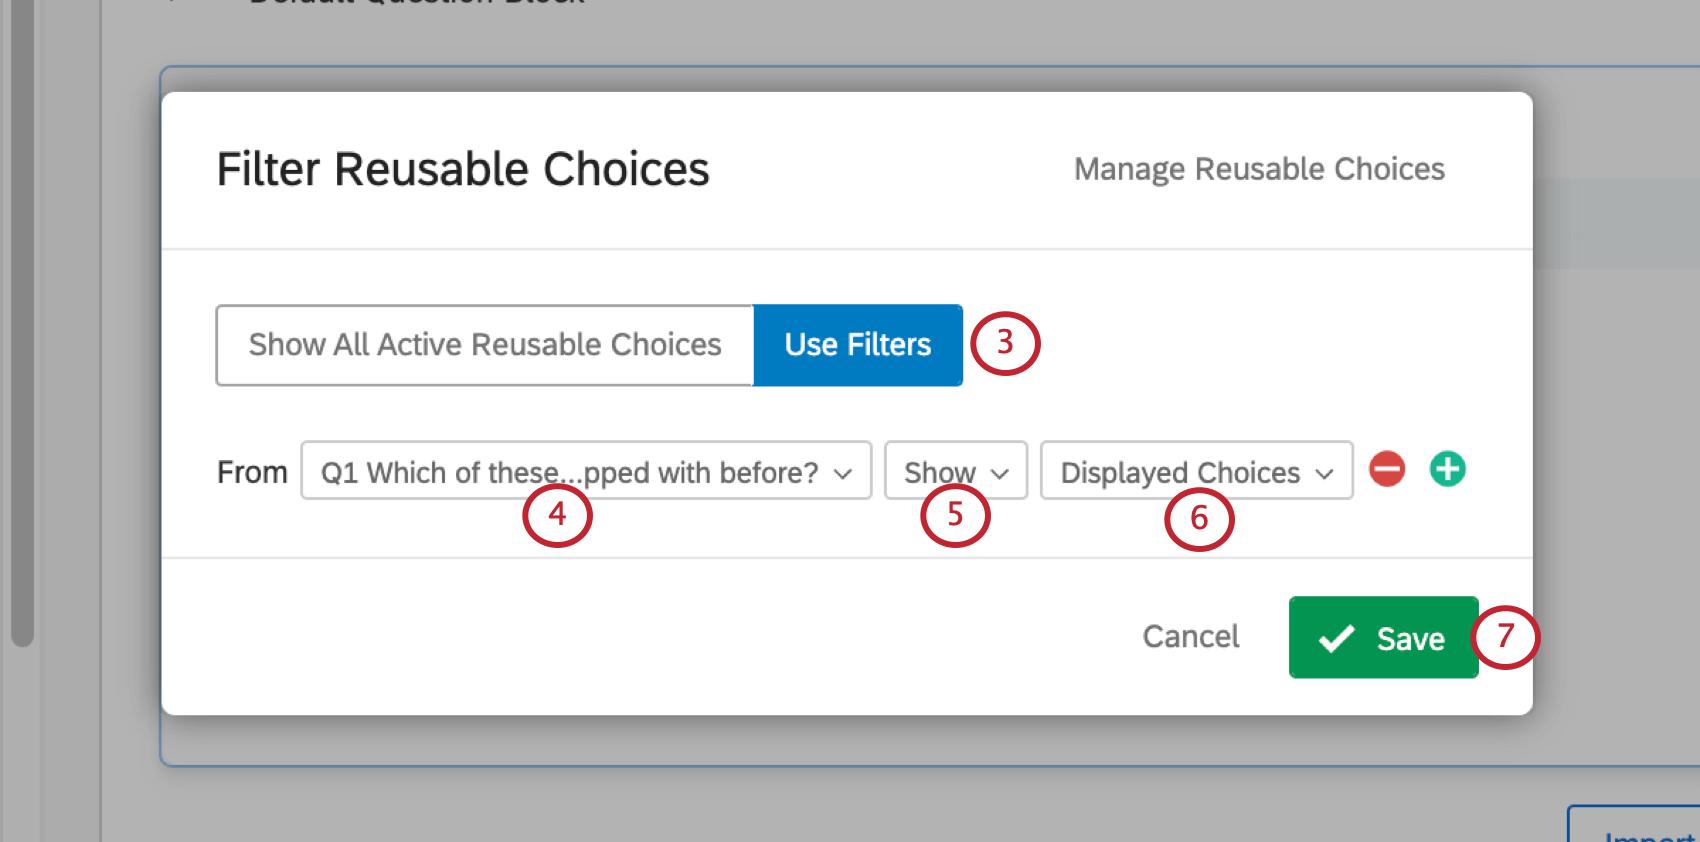 Filter Reusable Choices window